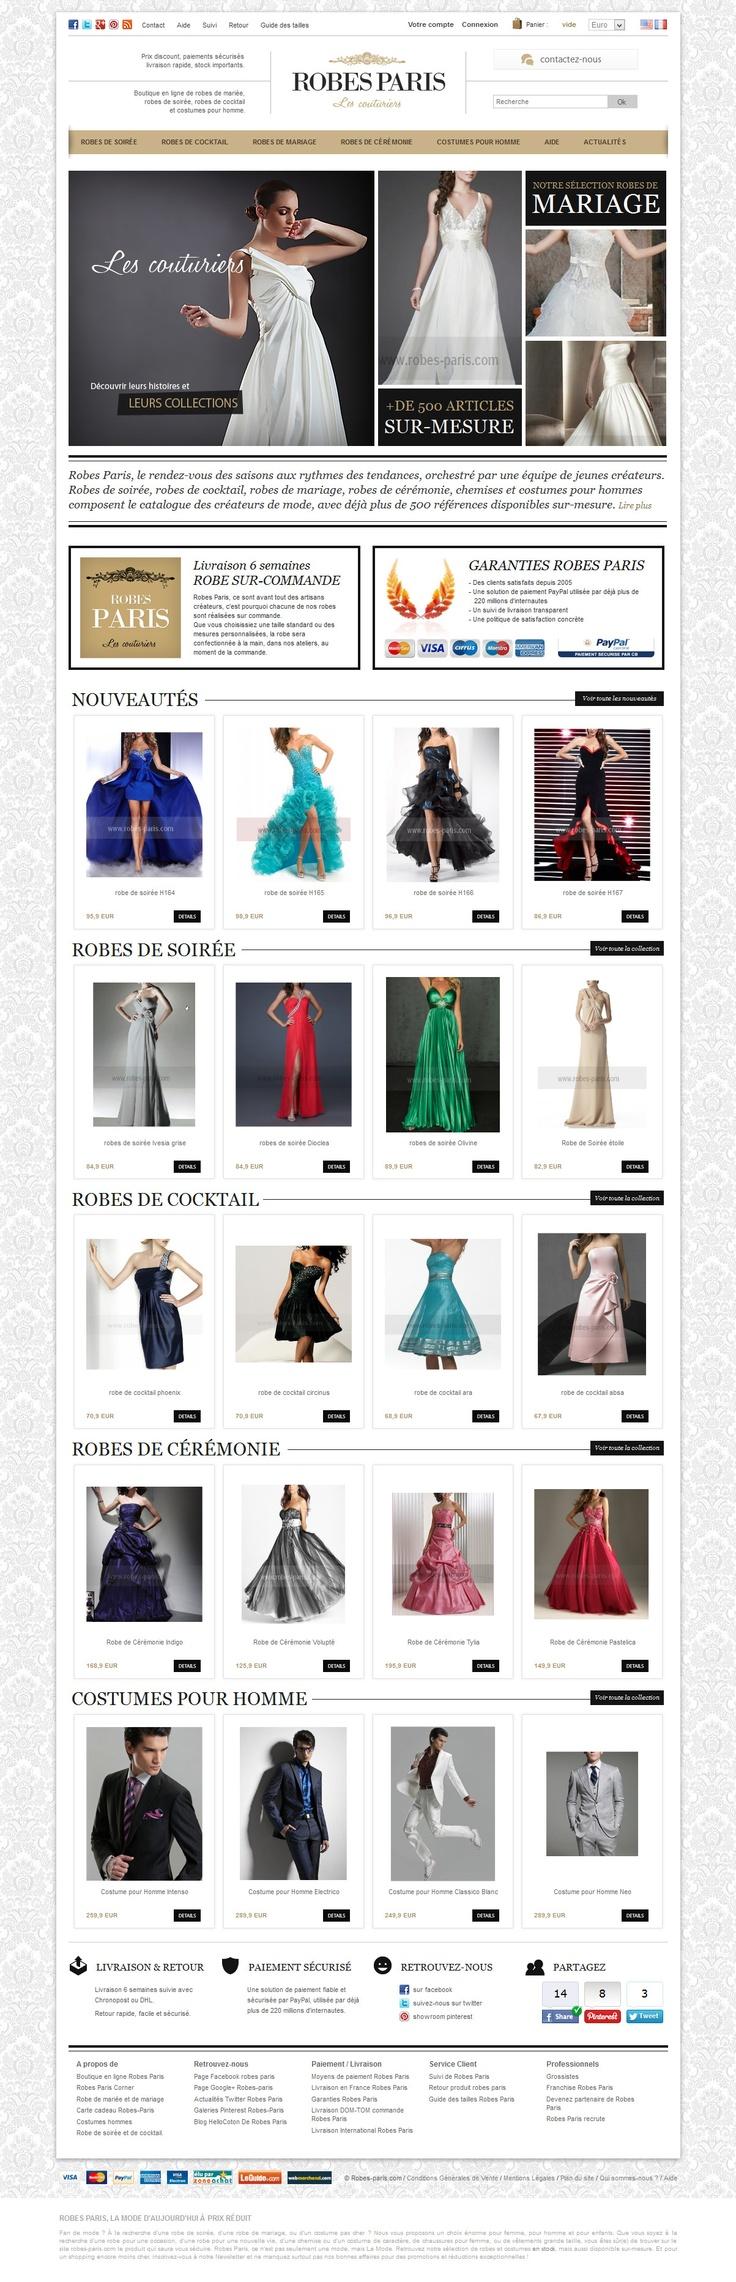 New dresses on robes-paris.com and 5% discount on your first order !: De Robe, Dress, Robe De, Robe Paris News, Robe Paris Com, La Robe, Robes Paris News, Robes Parise Com